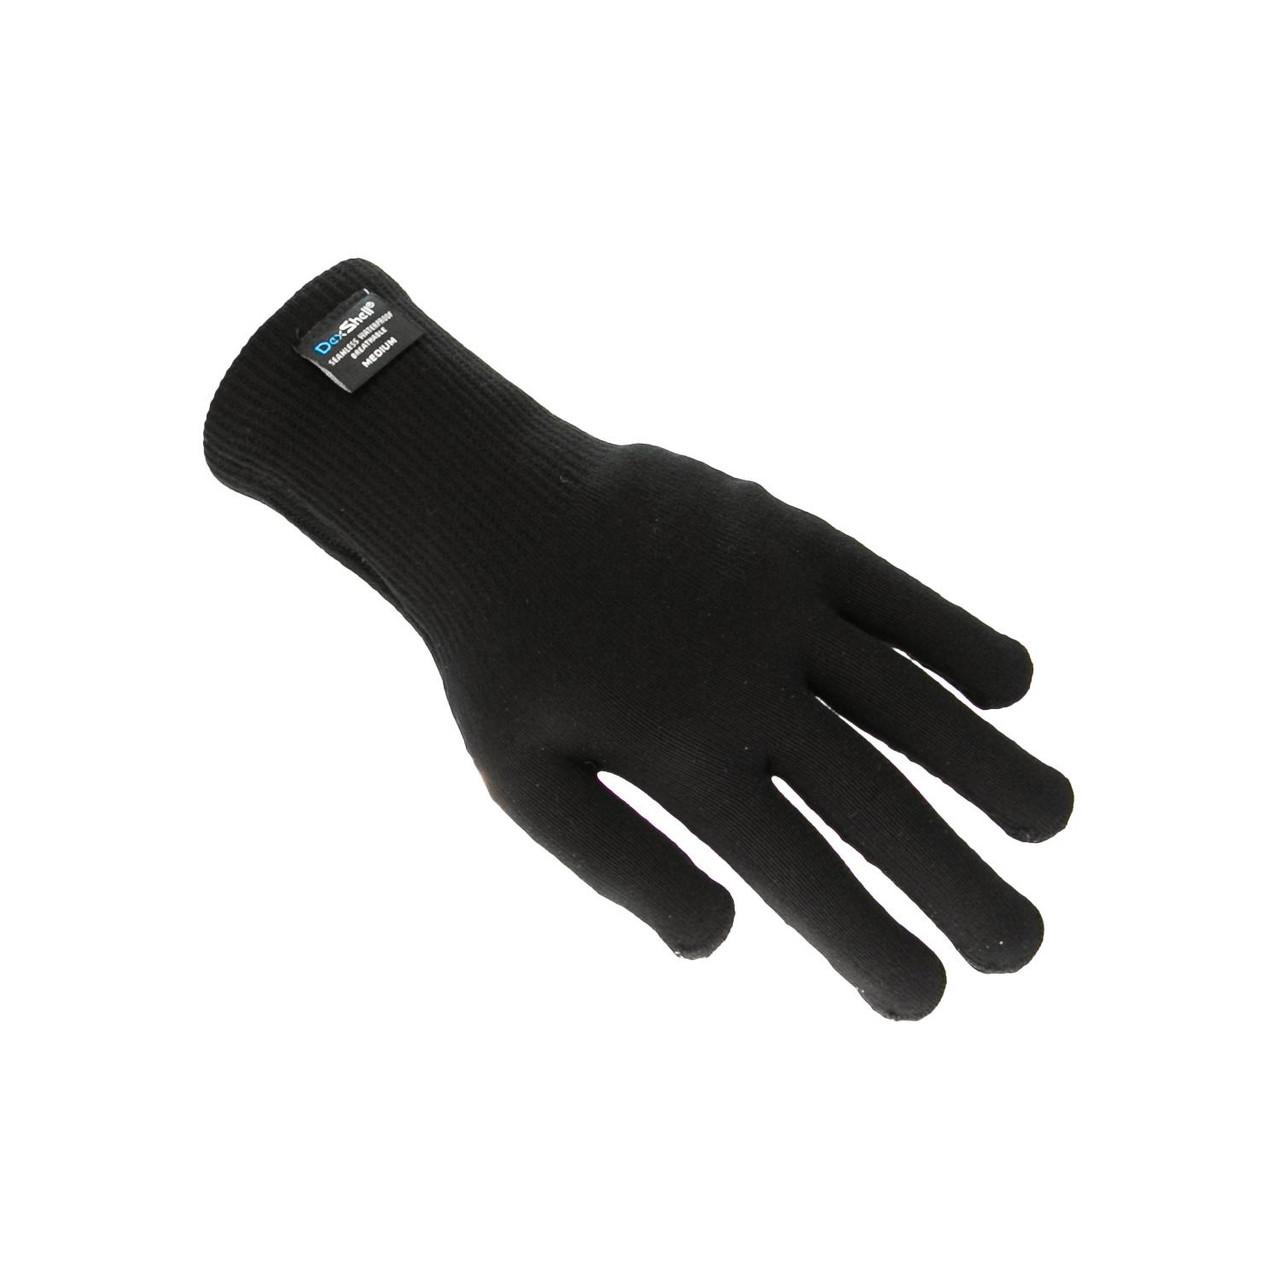 Dexshell Thermfit Waterproof Gloves (Medium)